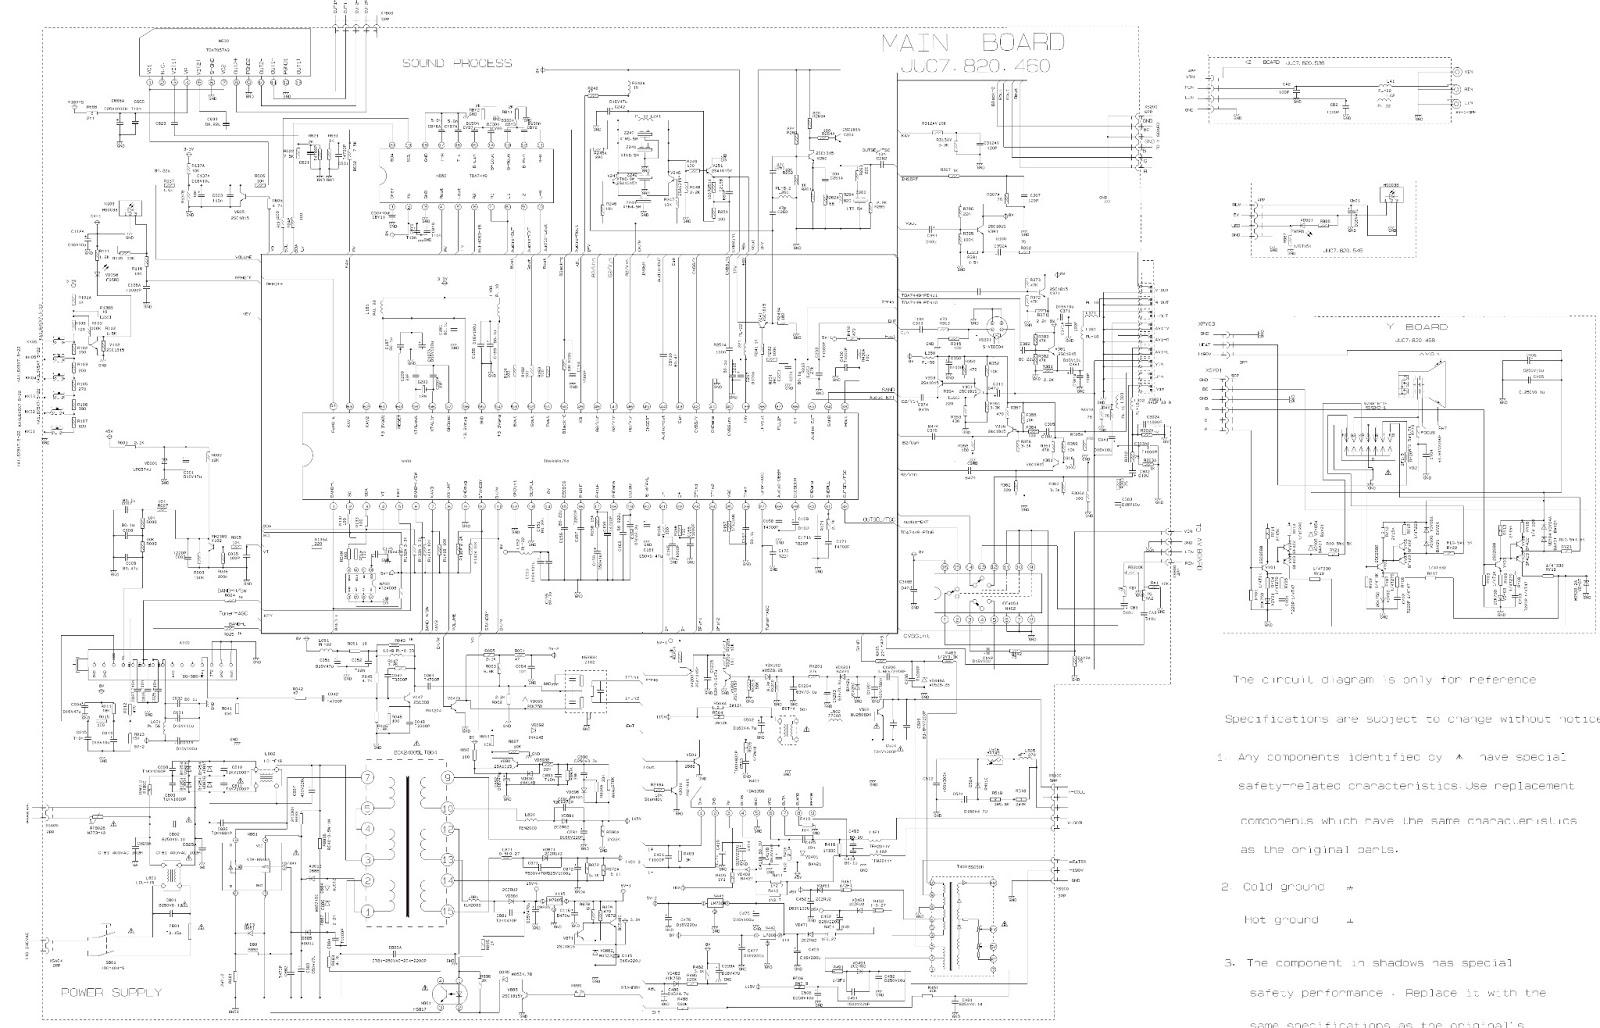 toshiba air conditioner wiring diagram toshiba tv schematic opto isolator wiring diagram [ 1600 x 1028 Pixel ]